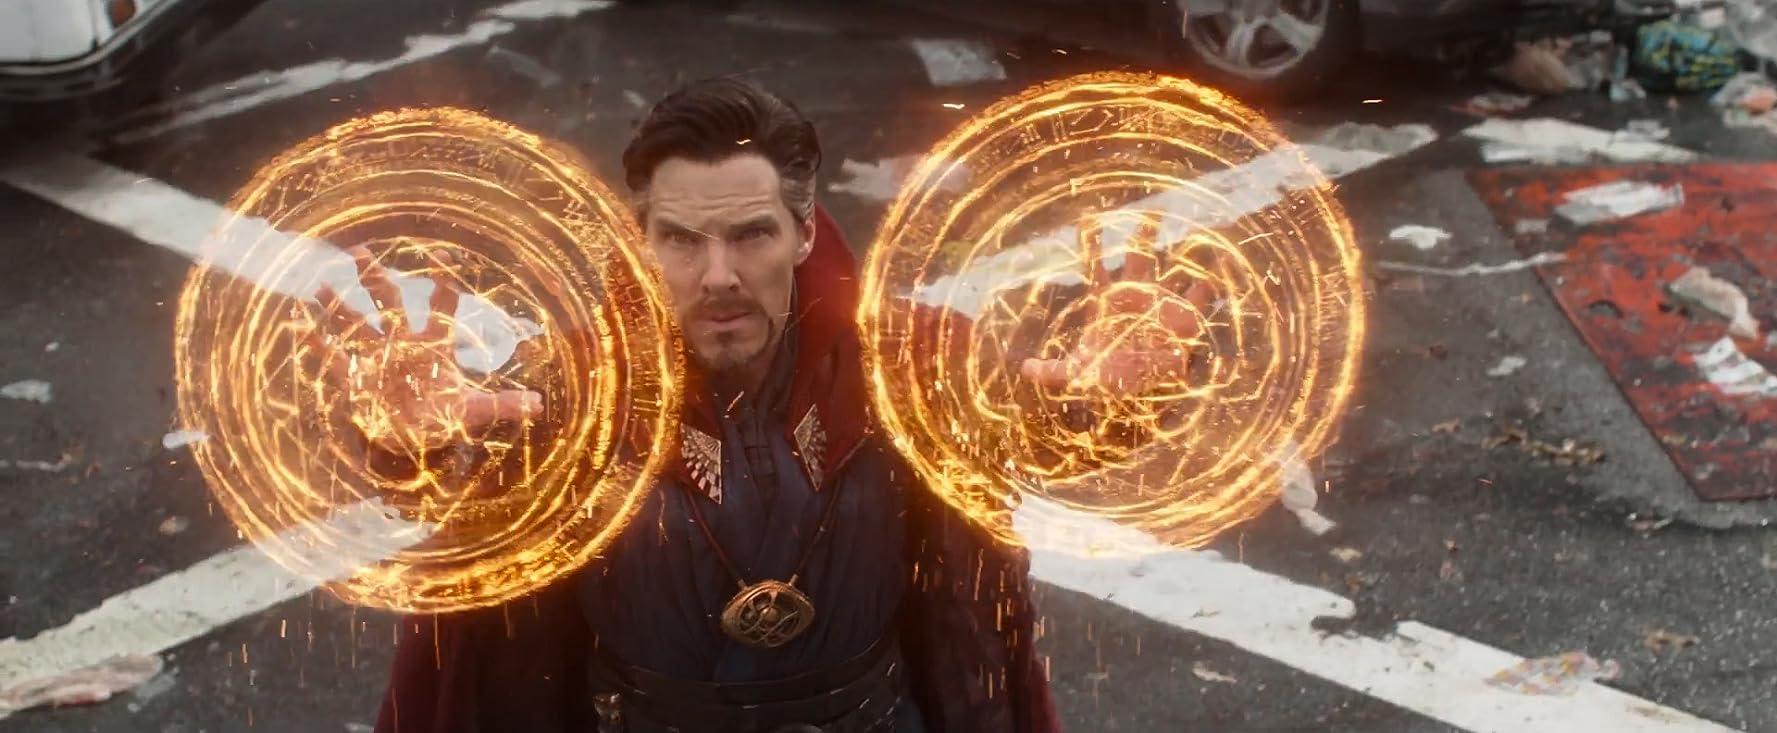 Avengers Infinity War Full Movie Free